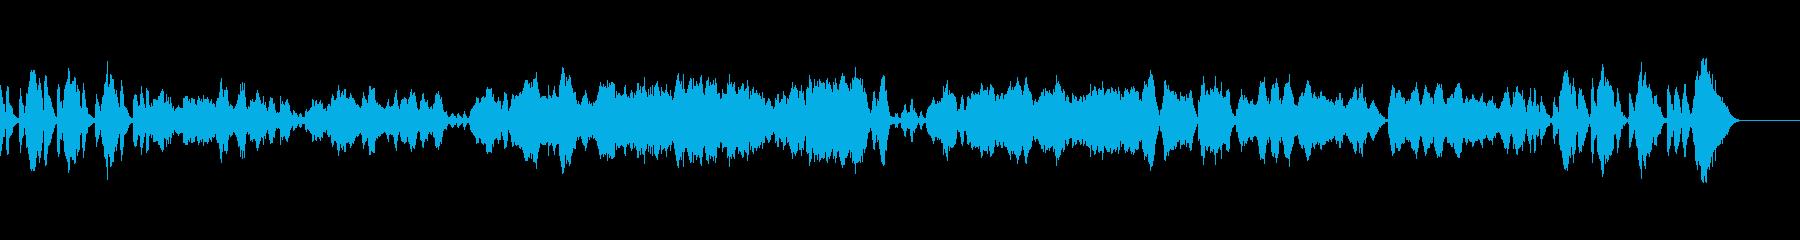 RV522_2『ラルゲット』ビバルディの再生済みの波形